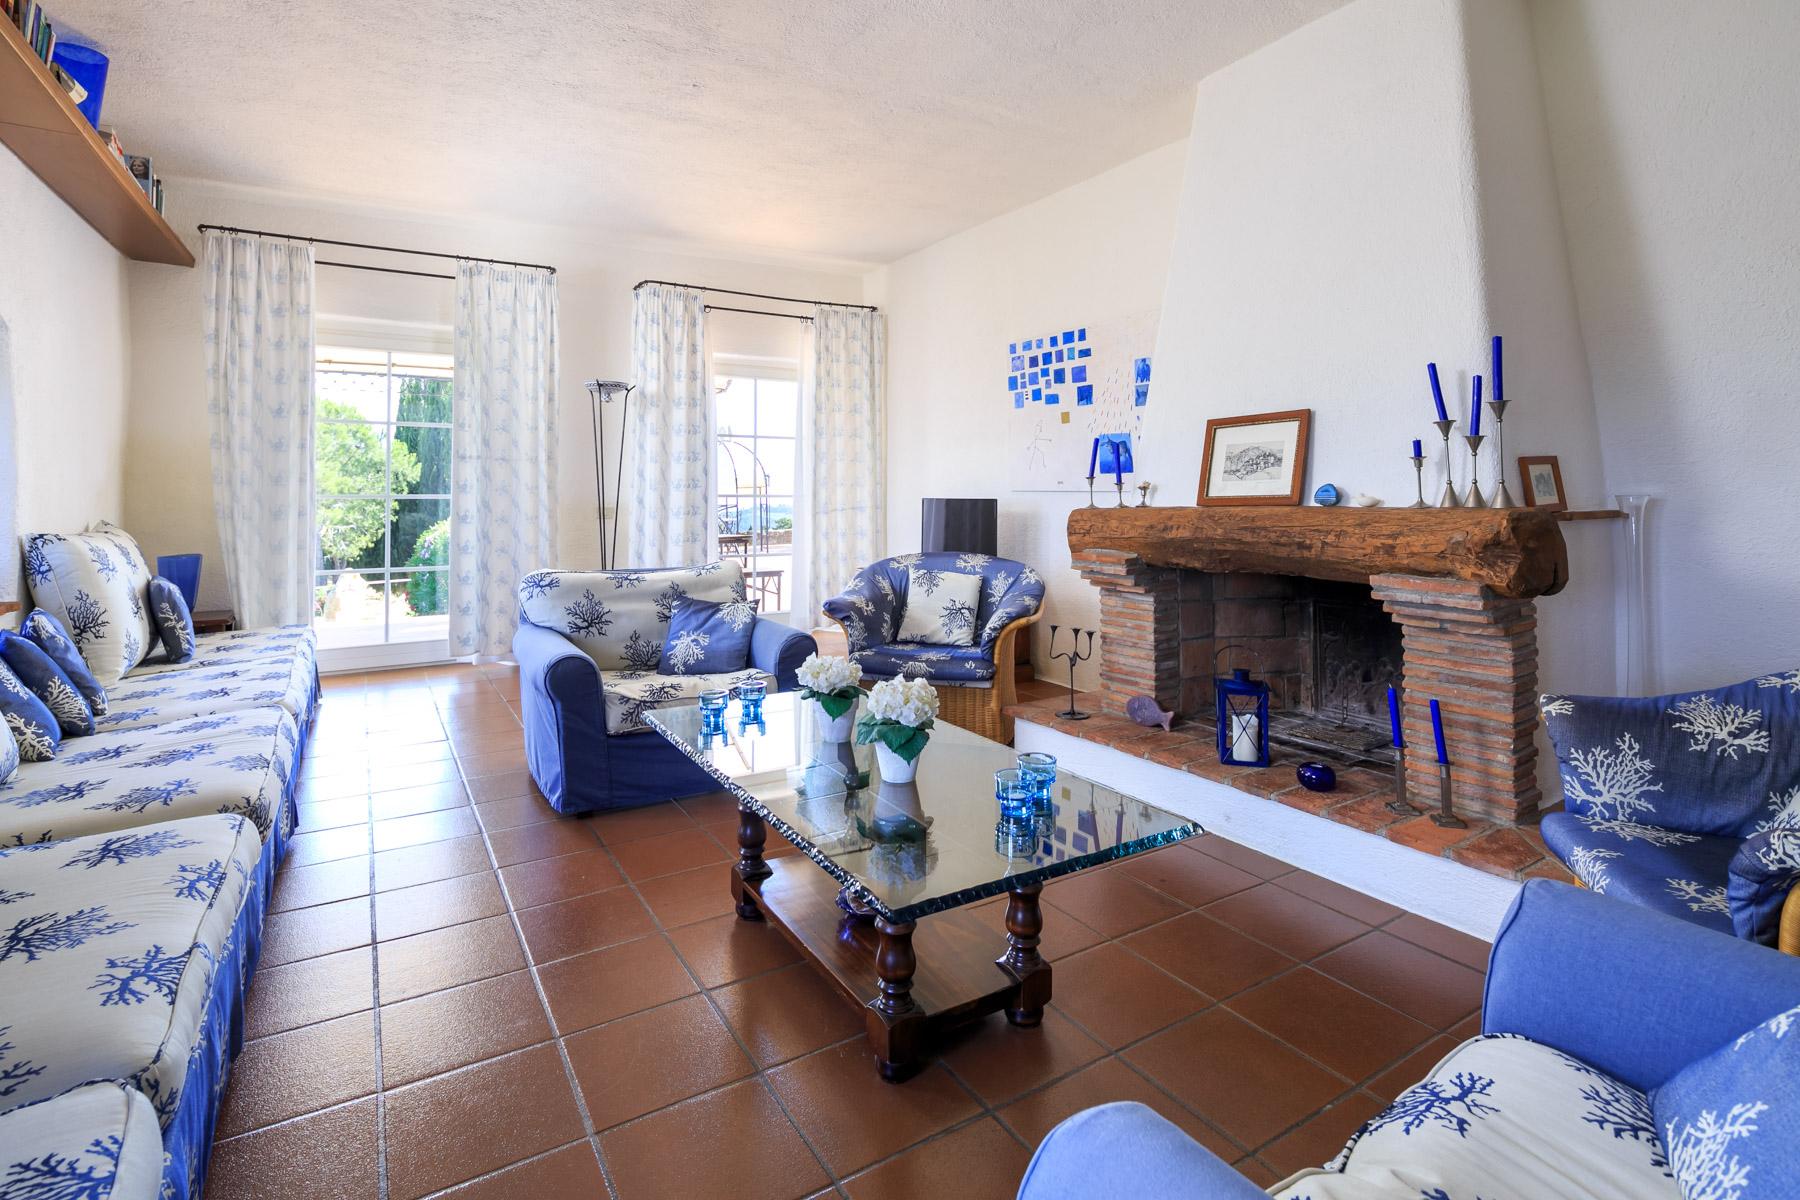 Villa in Vendita a Campiglia Marittima: 5 locali, 1100 mq - Foto 25